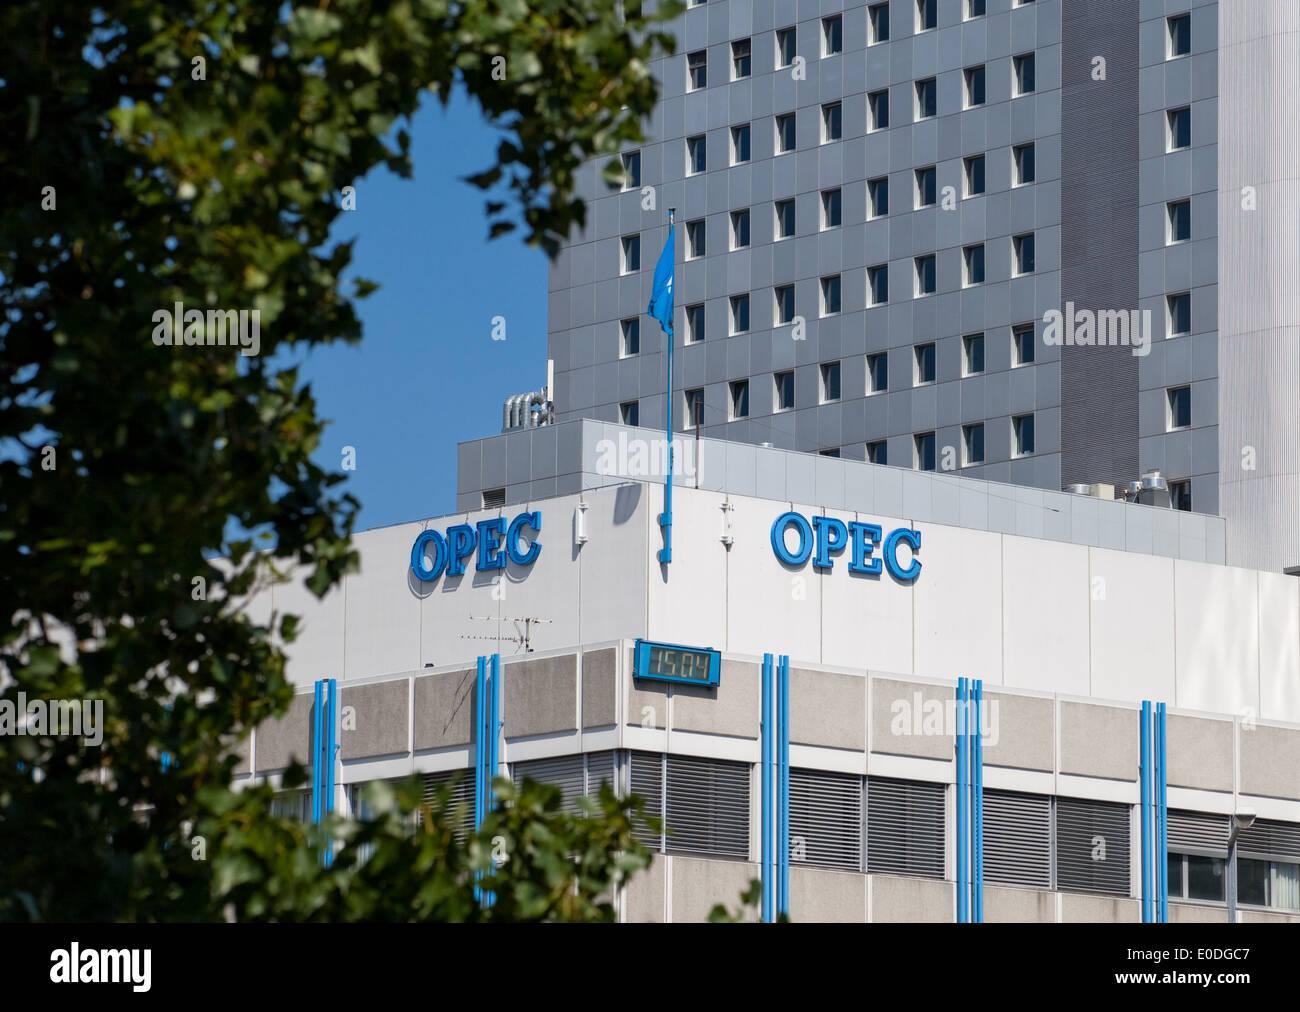 OPEC Zentrale, Wien, Österreich - OPEC headquarters, Vienna, Austria - Stock Image